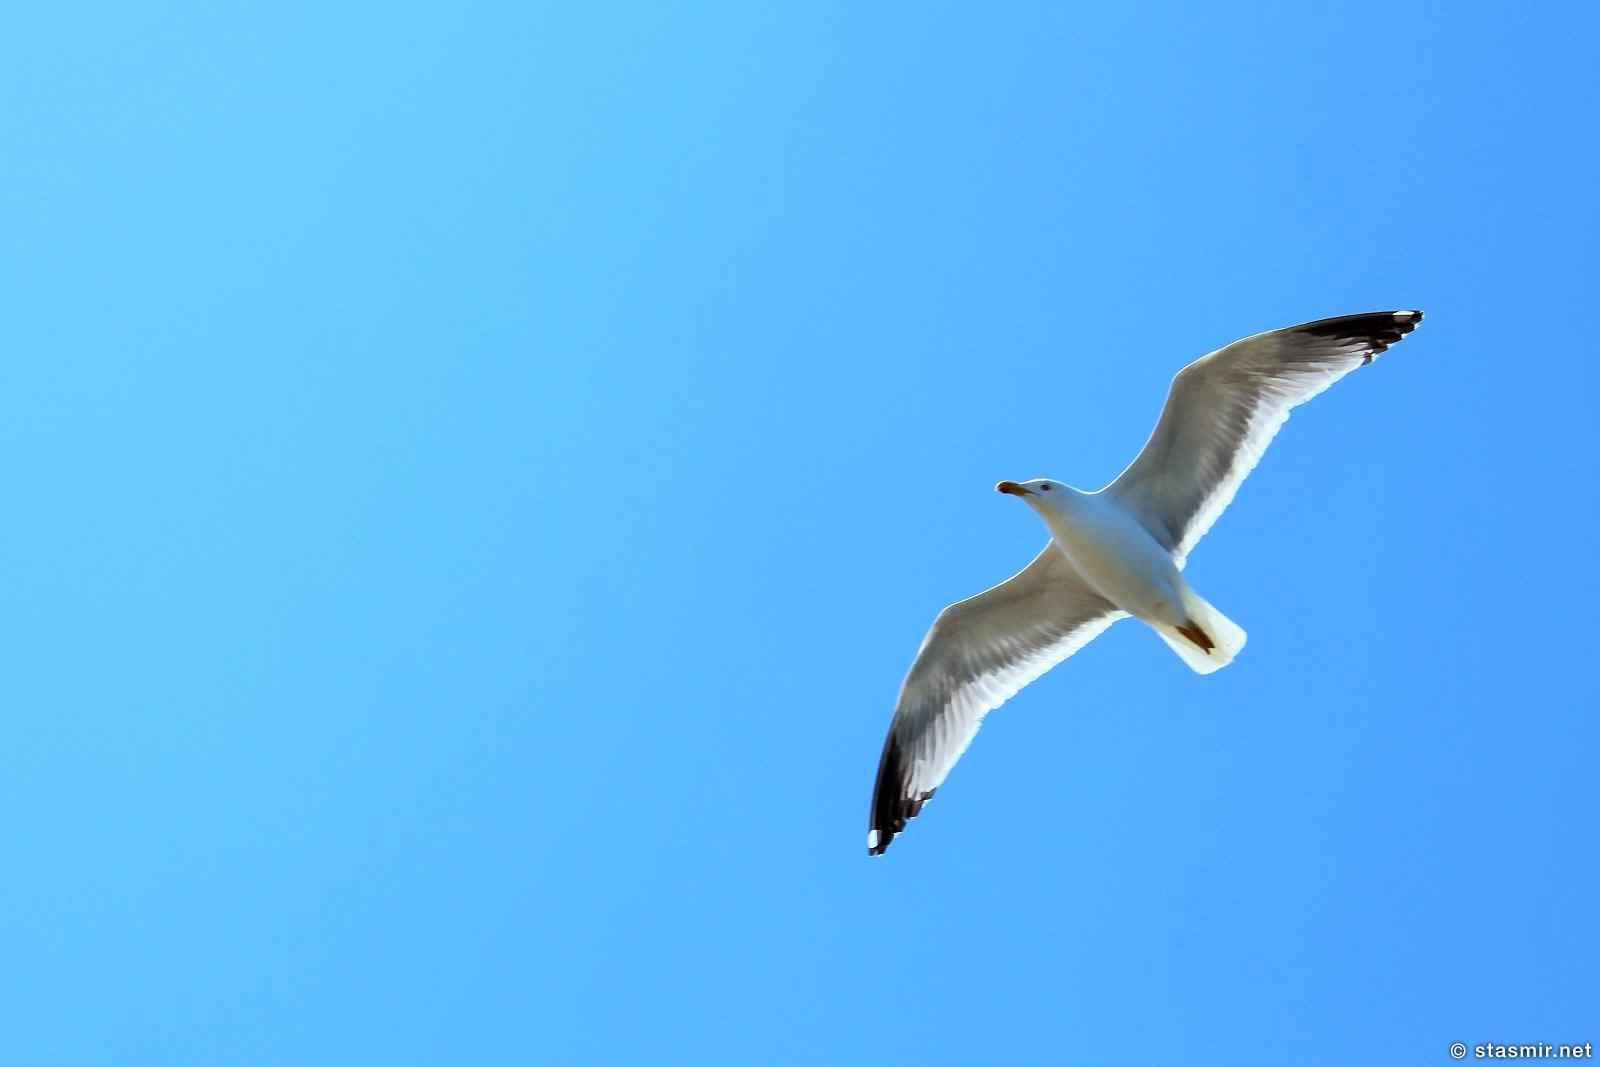 Чайка, Mávurinn, seagull, реет чайка, фото Стасмир, Photo Stasmir